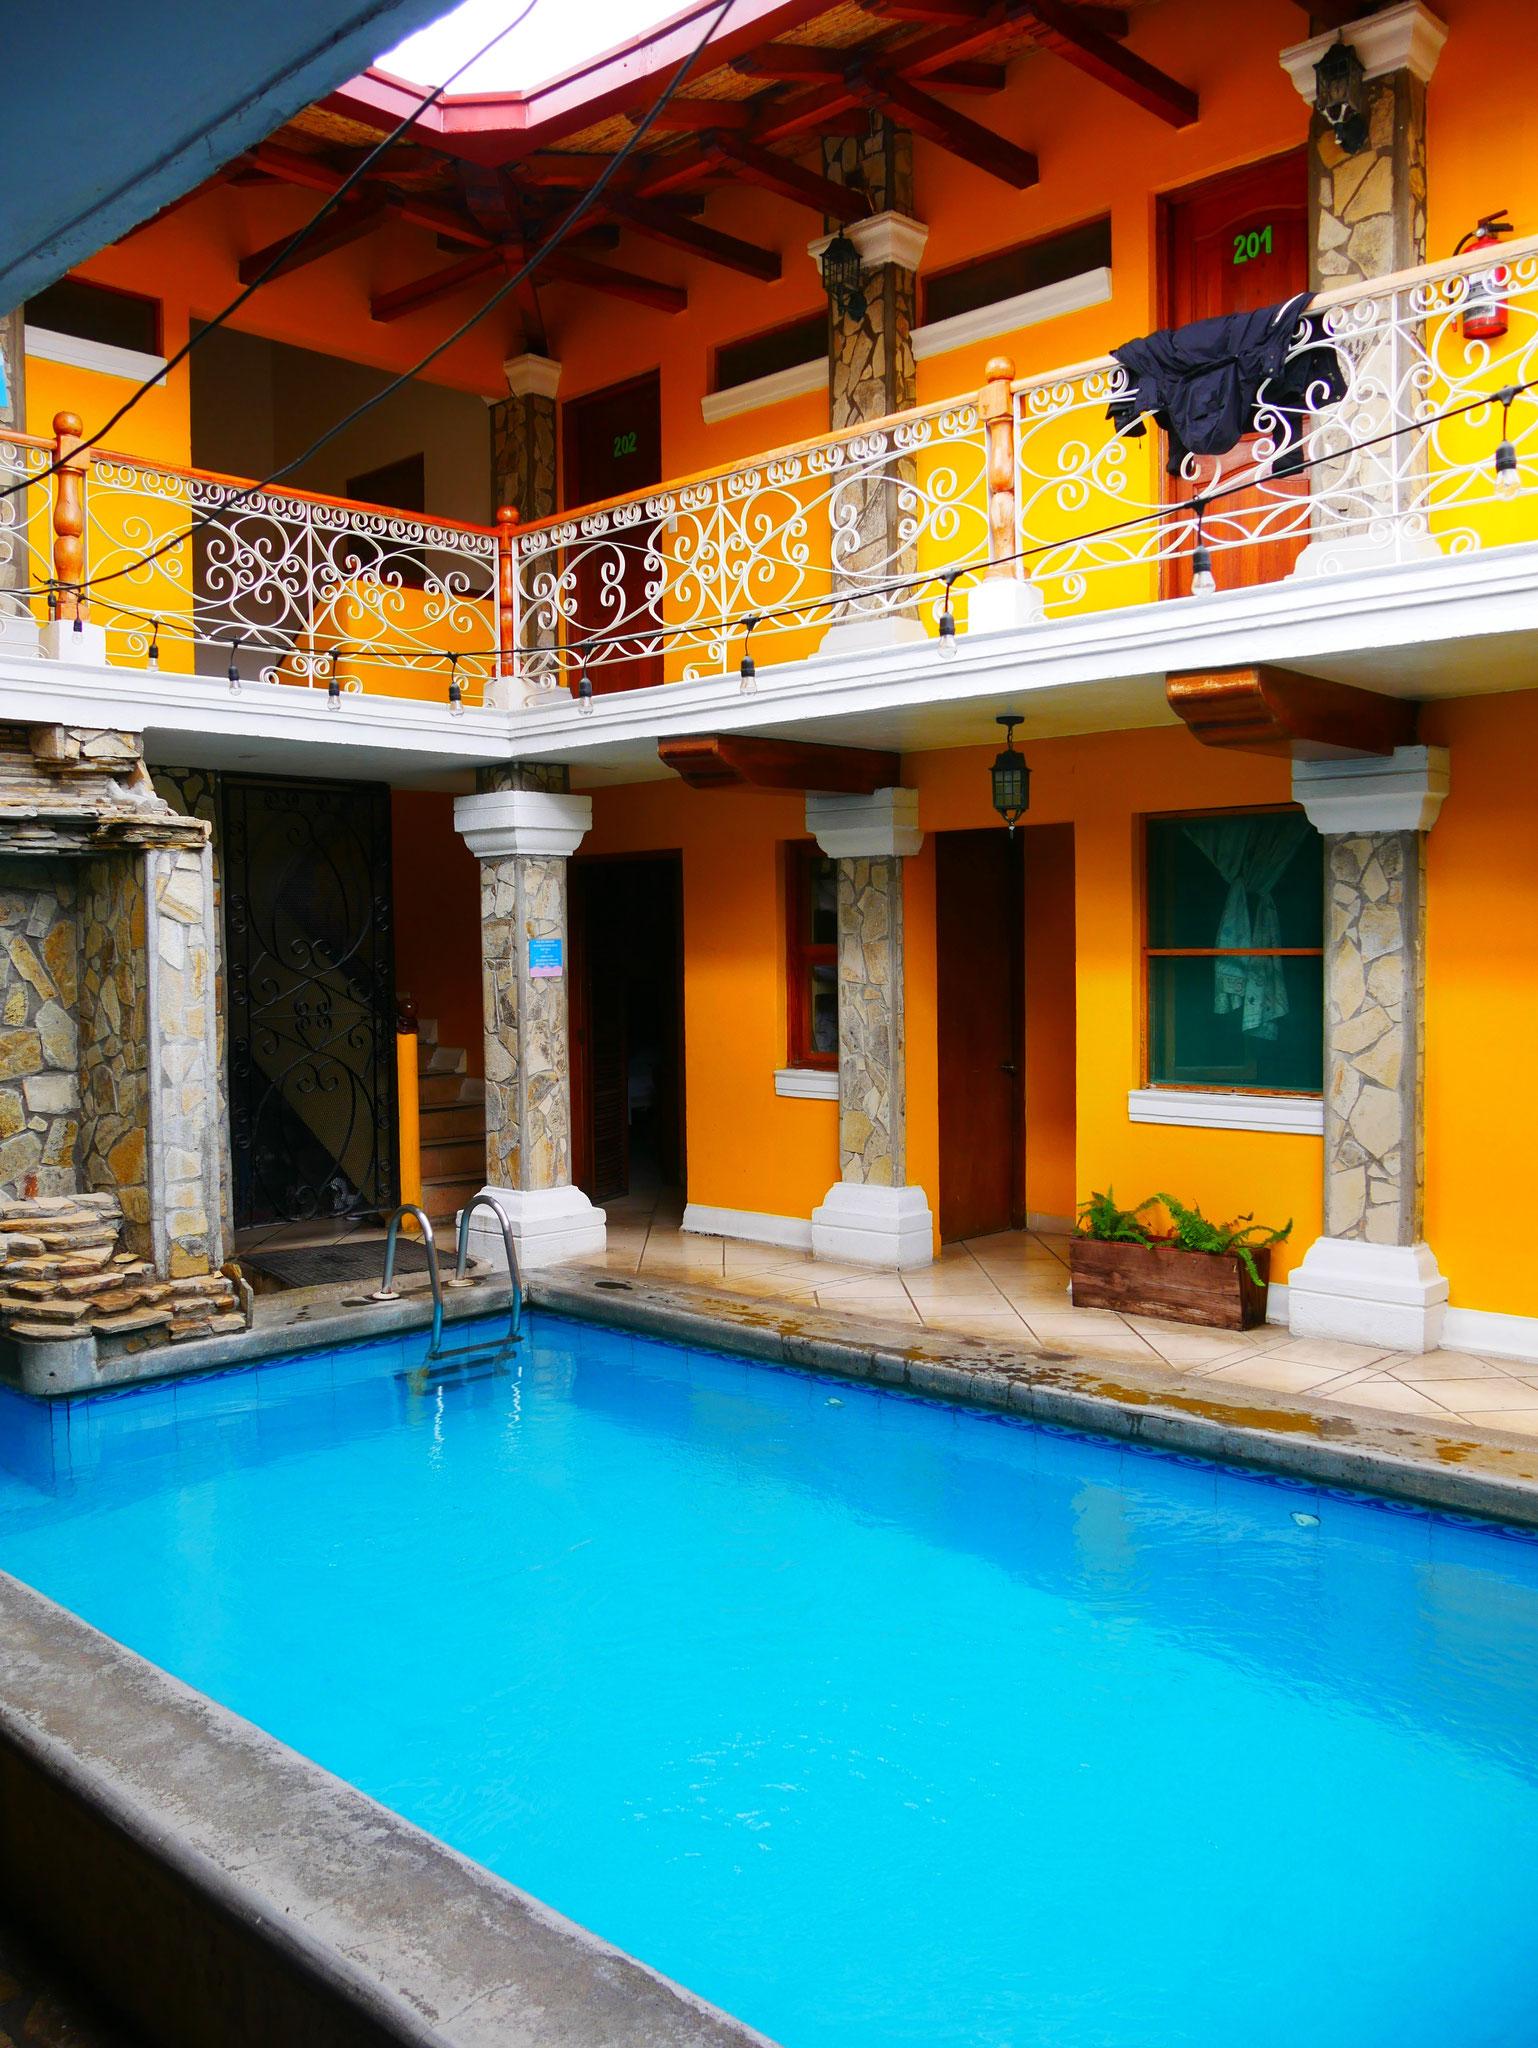 Hostel Oasis, Granada